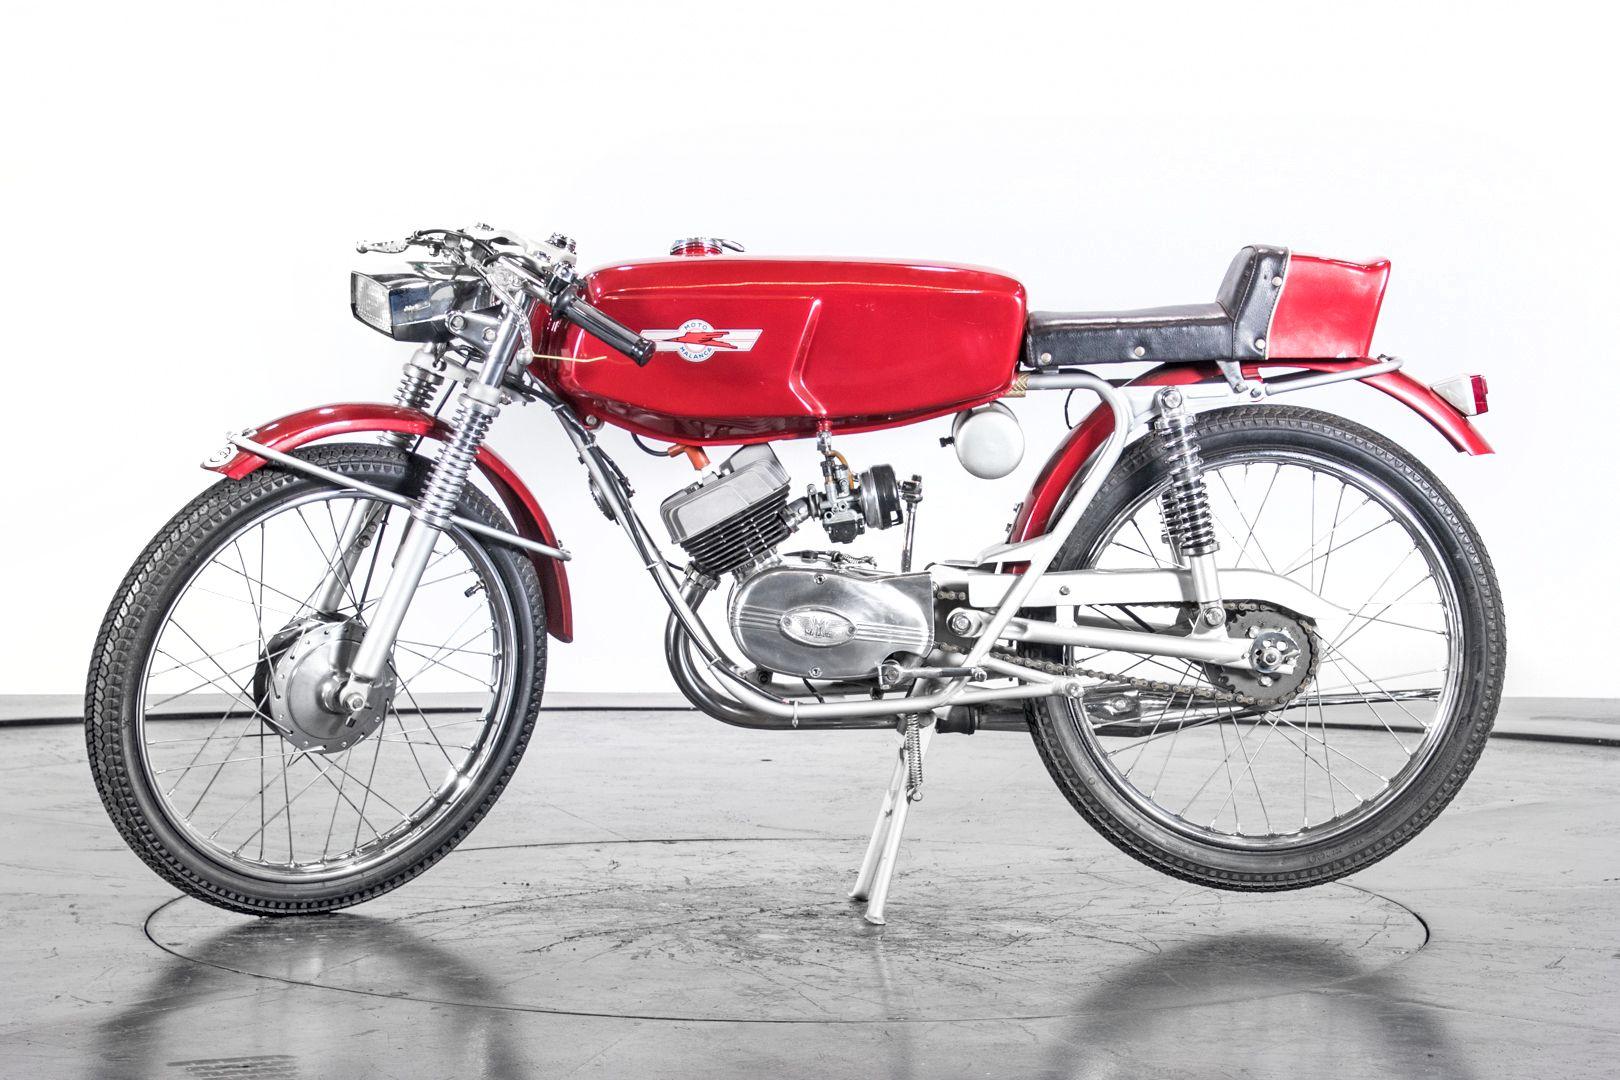 1963 Malanca Nicky 50 41158